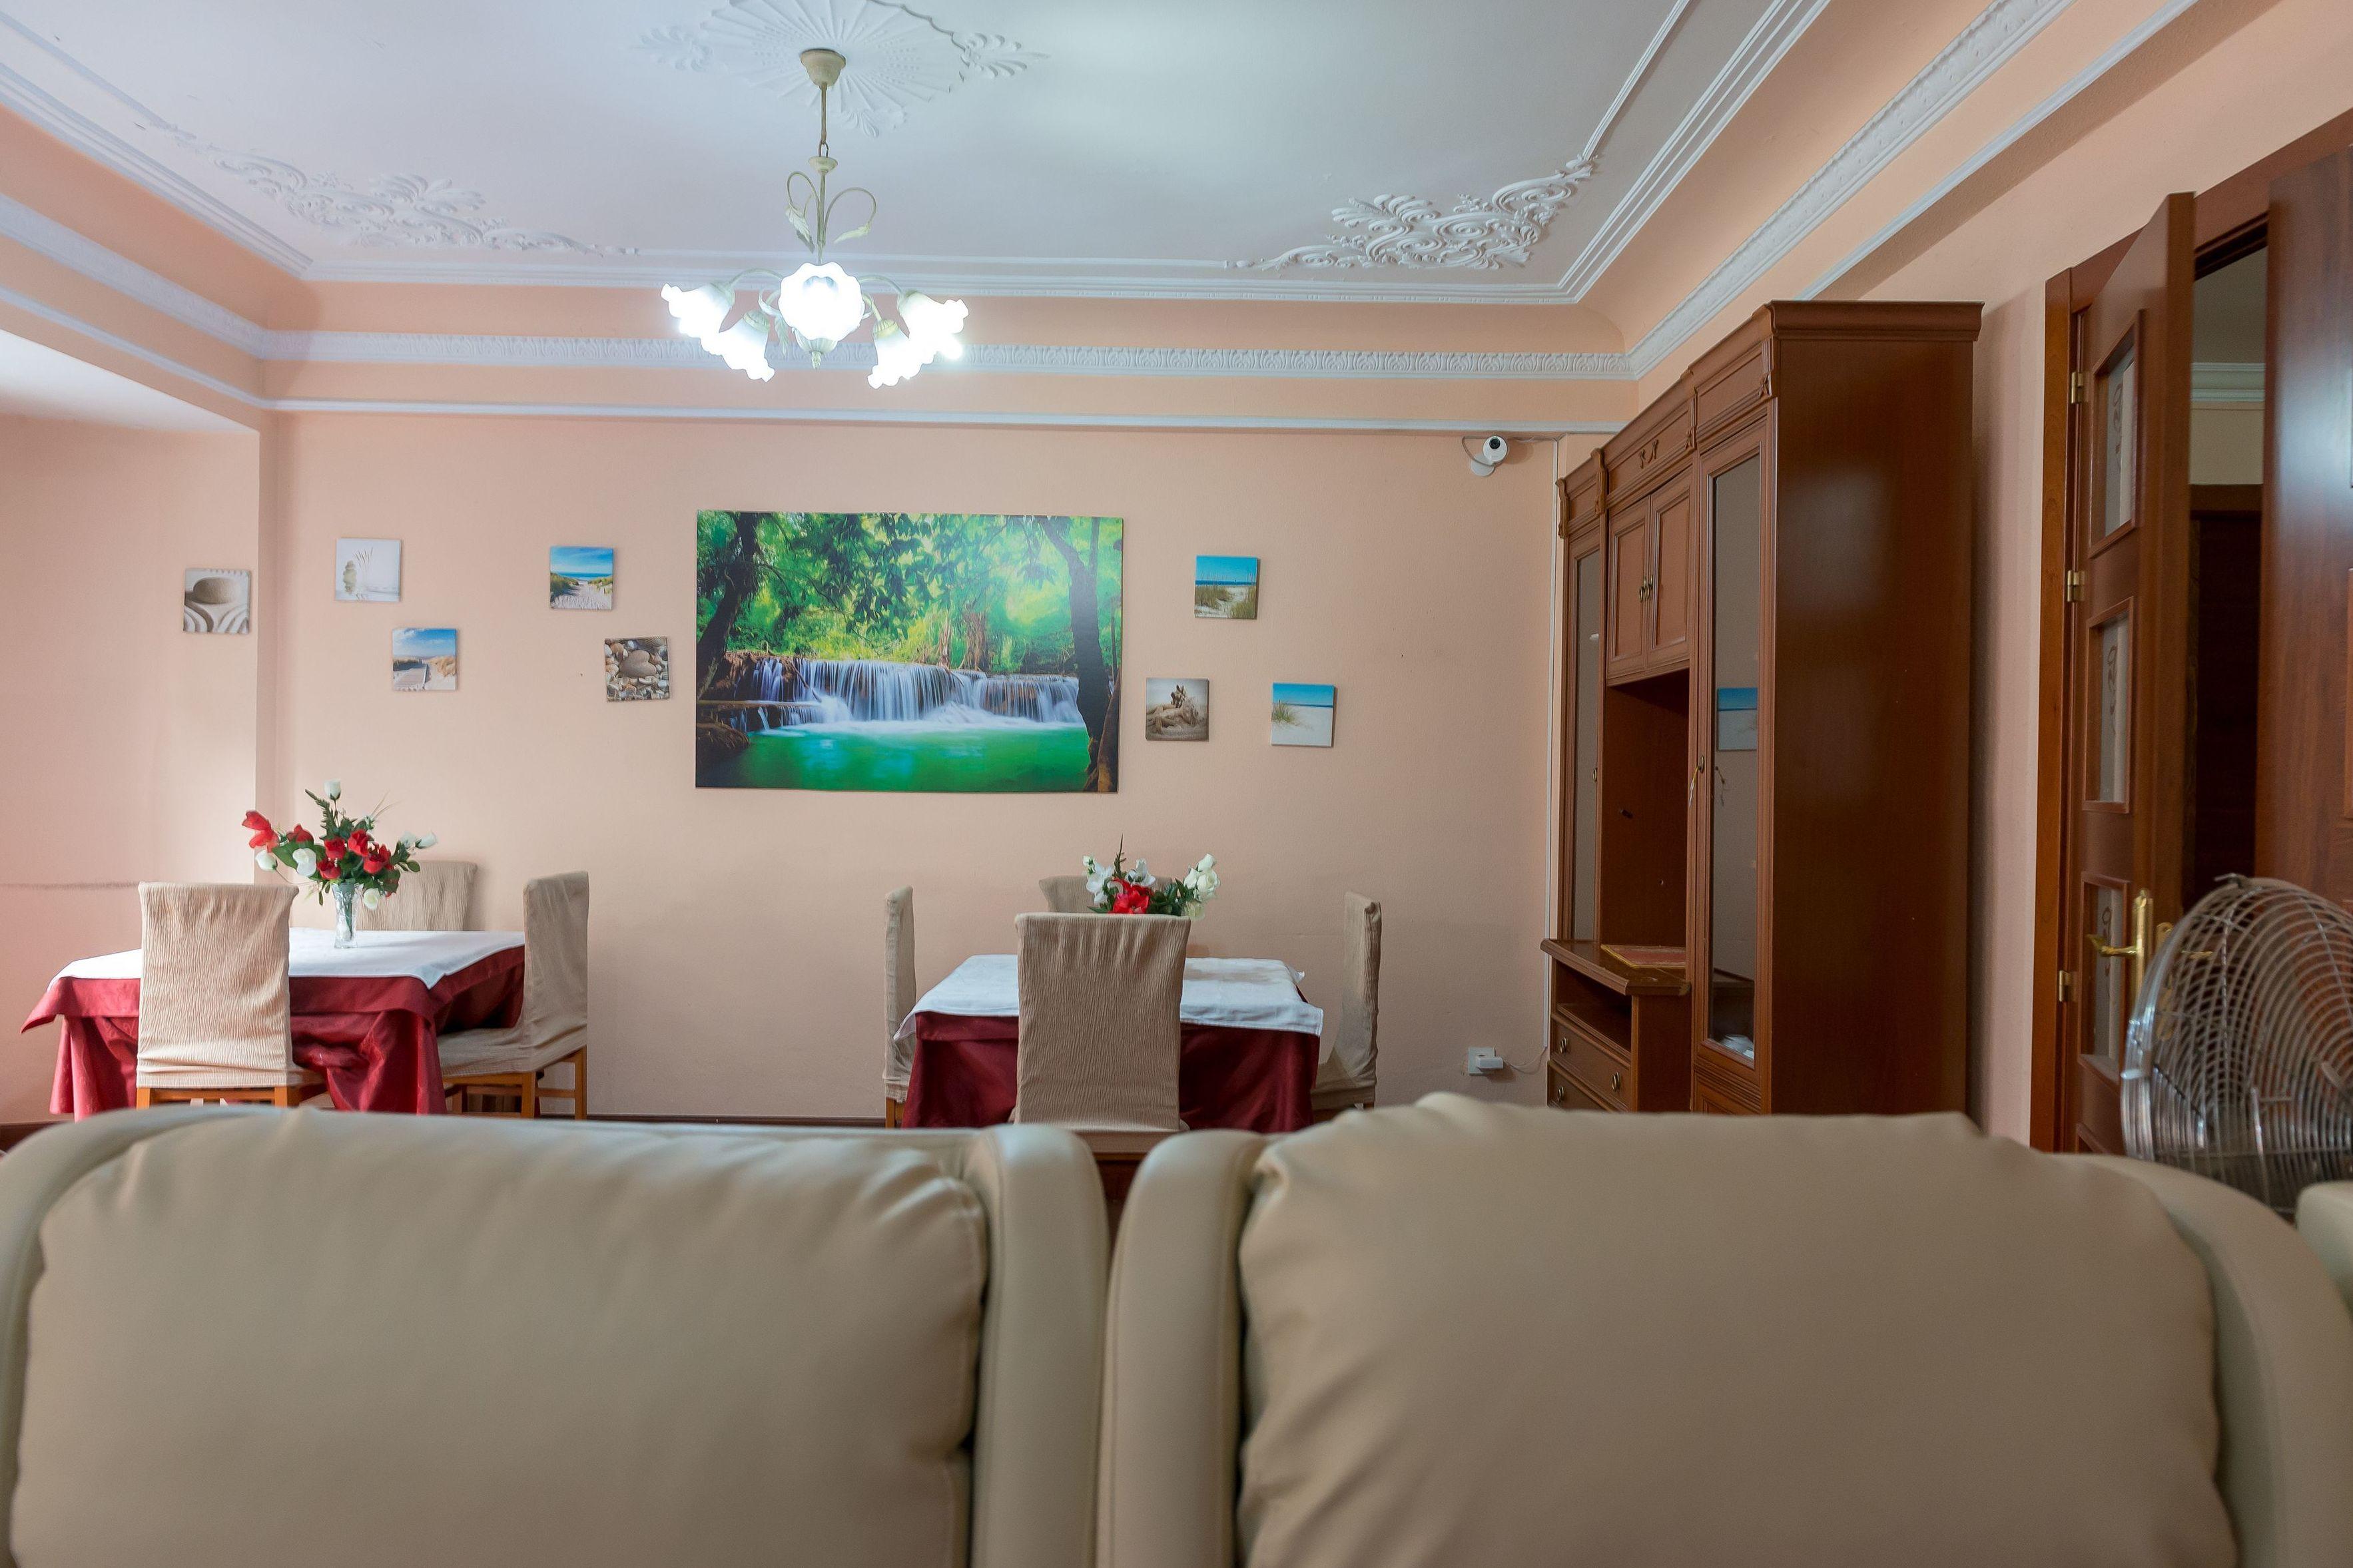 Foto 32 de Residencia para la tercera edad en Bilbo   Residencia Garai